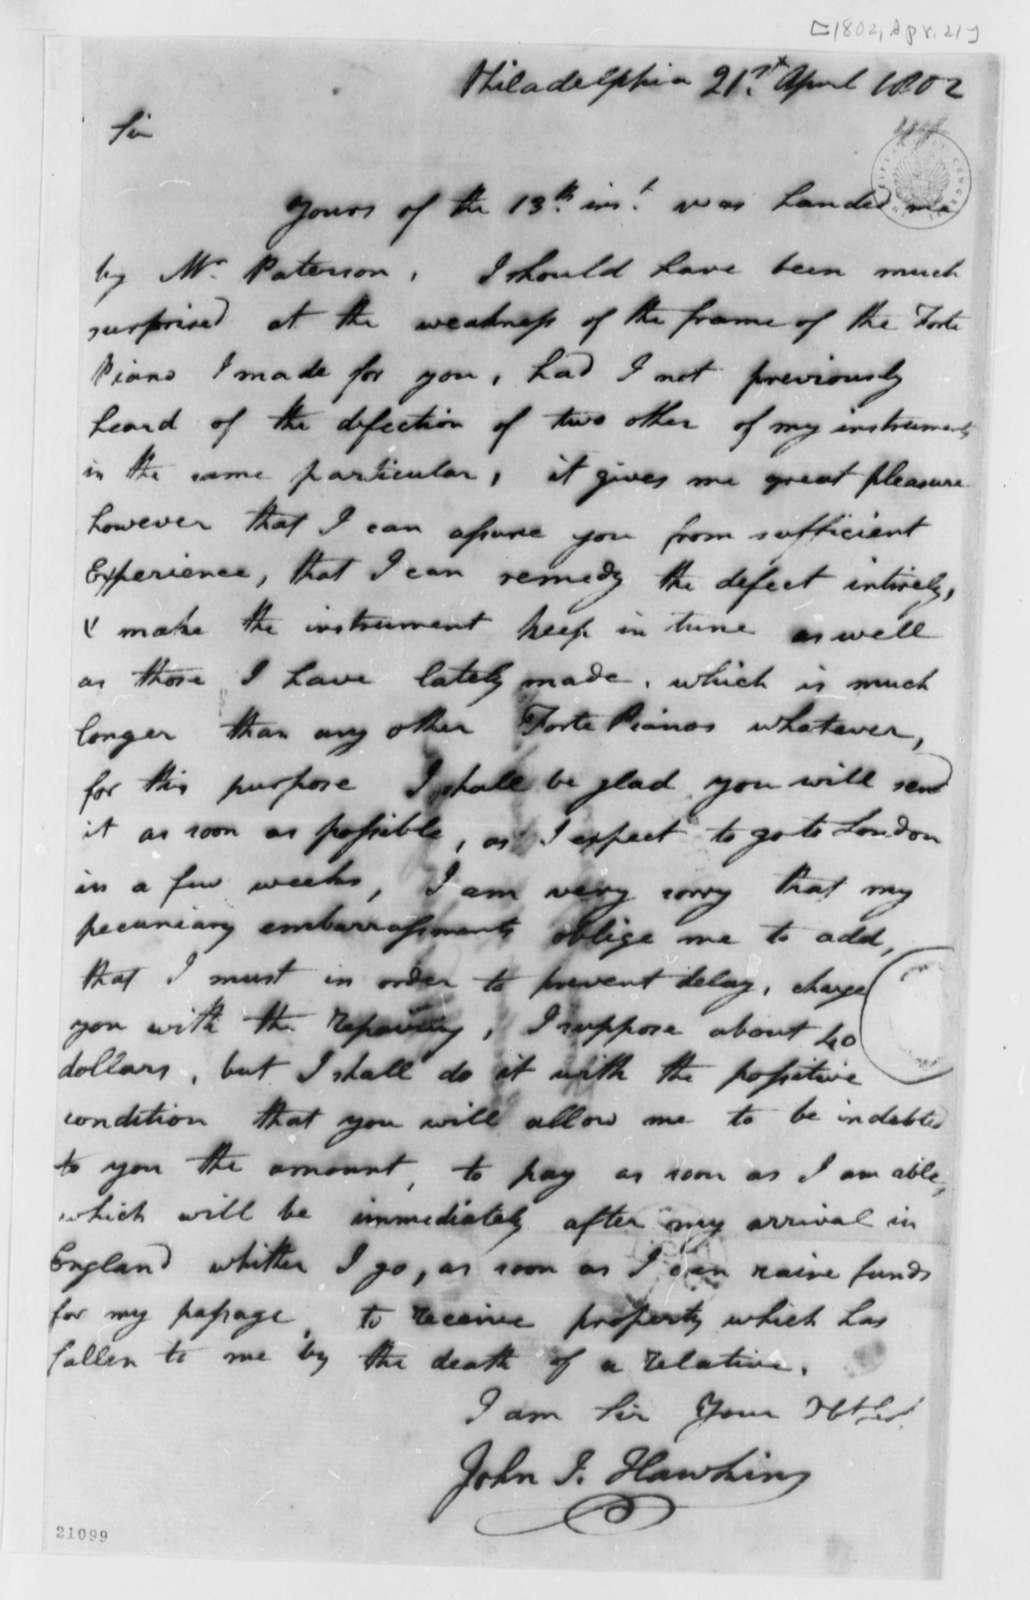 John Isaac Hawkins to Thomas Jefferson, April 21, 1802